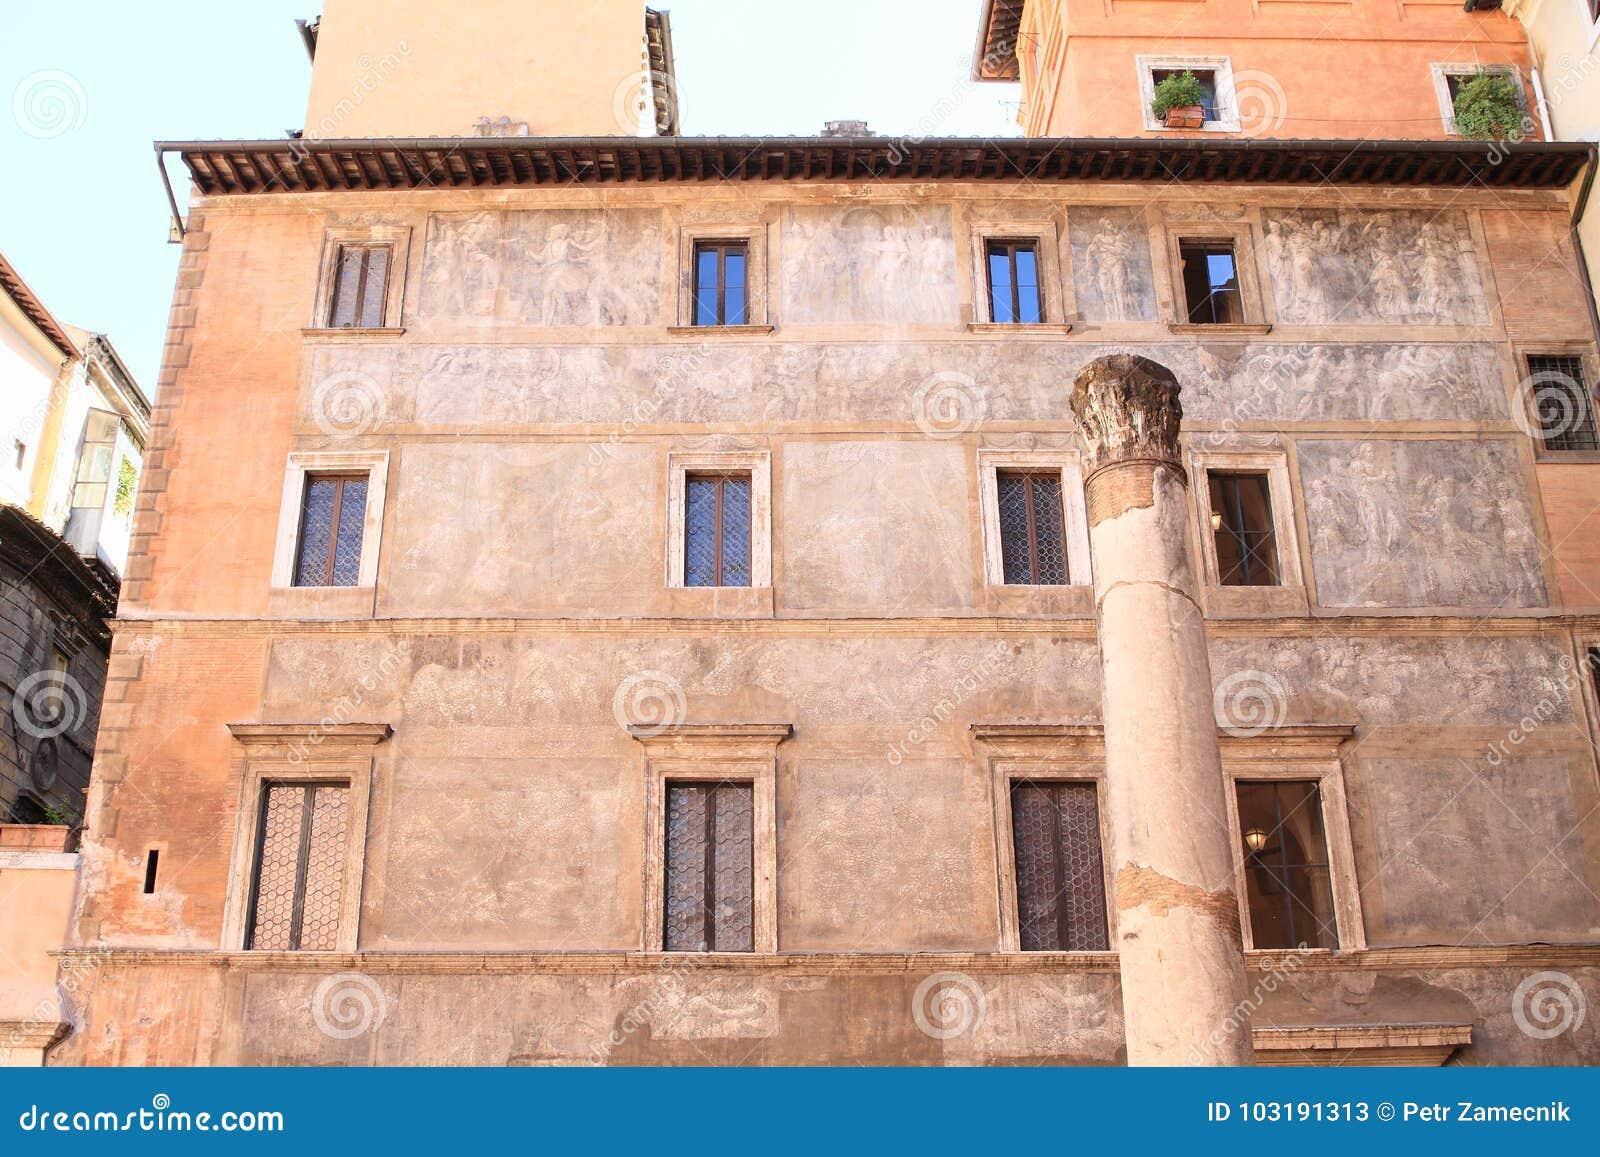 Coluna antiga em Roma